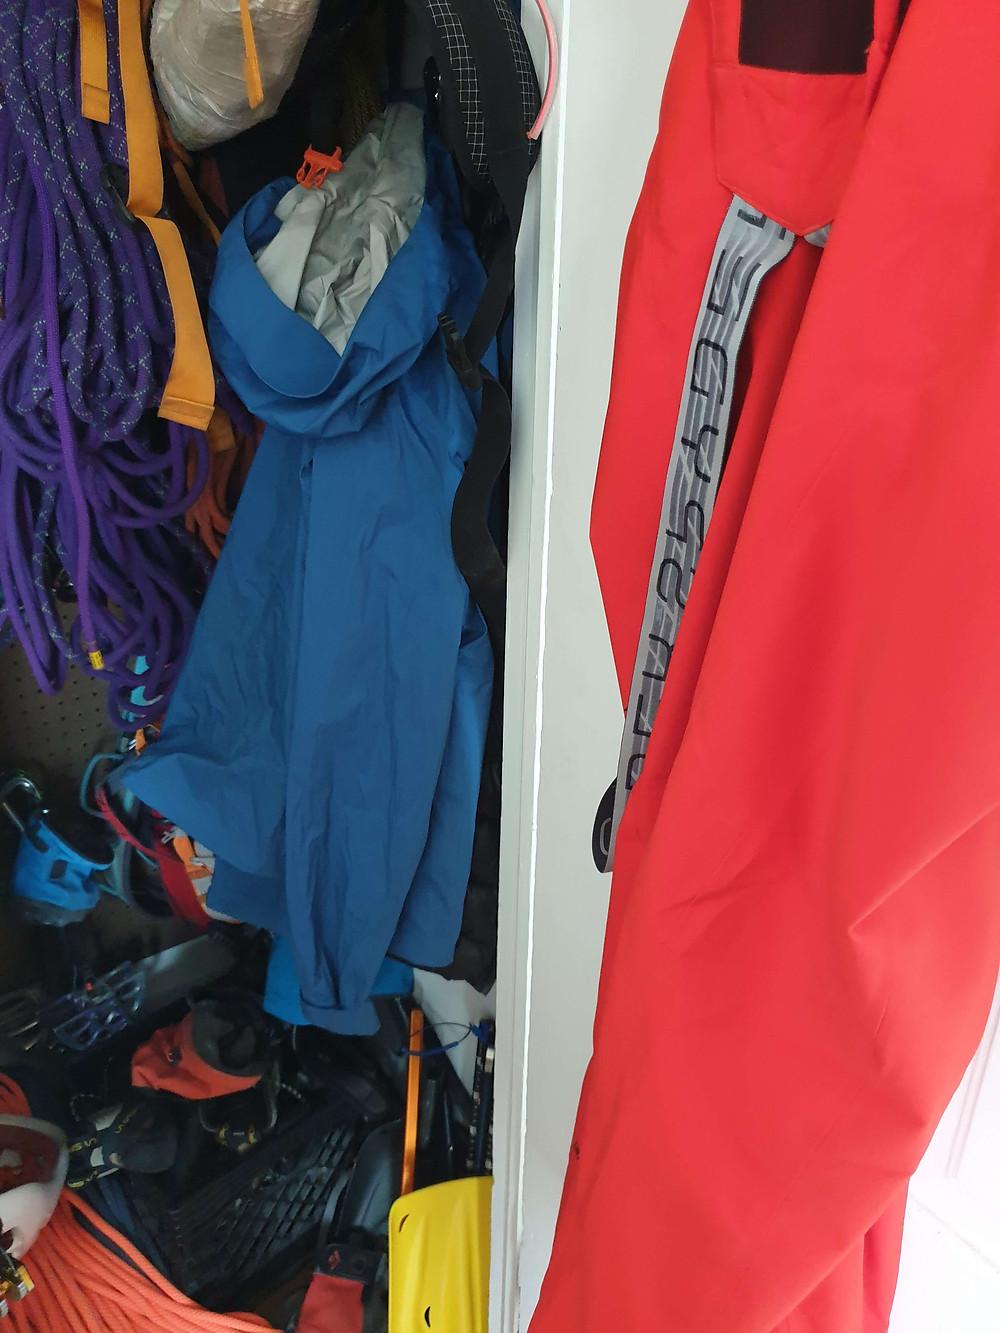 Spyder ski pants and a shell